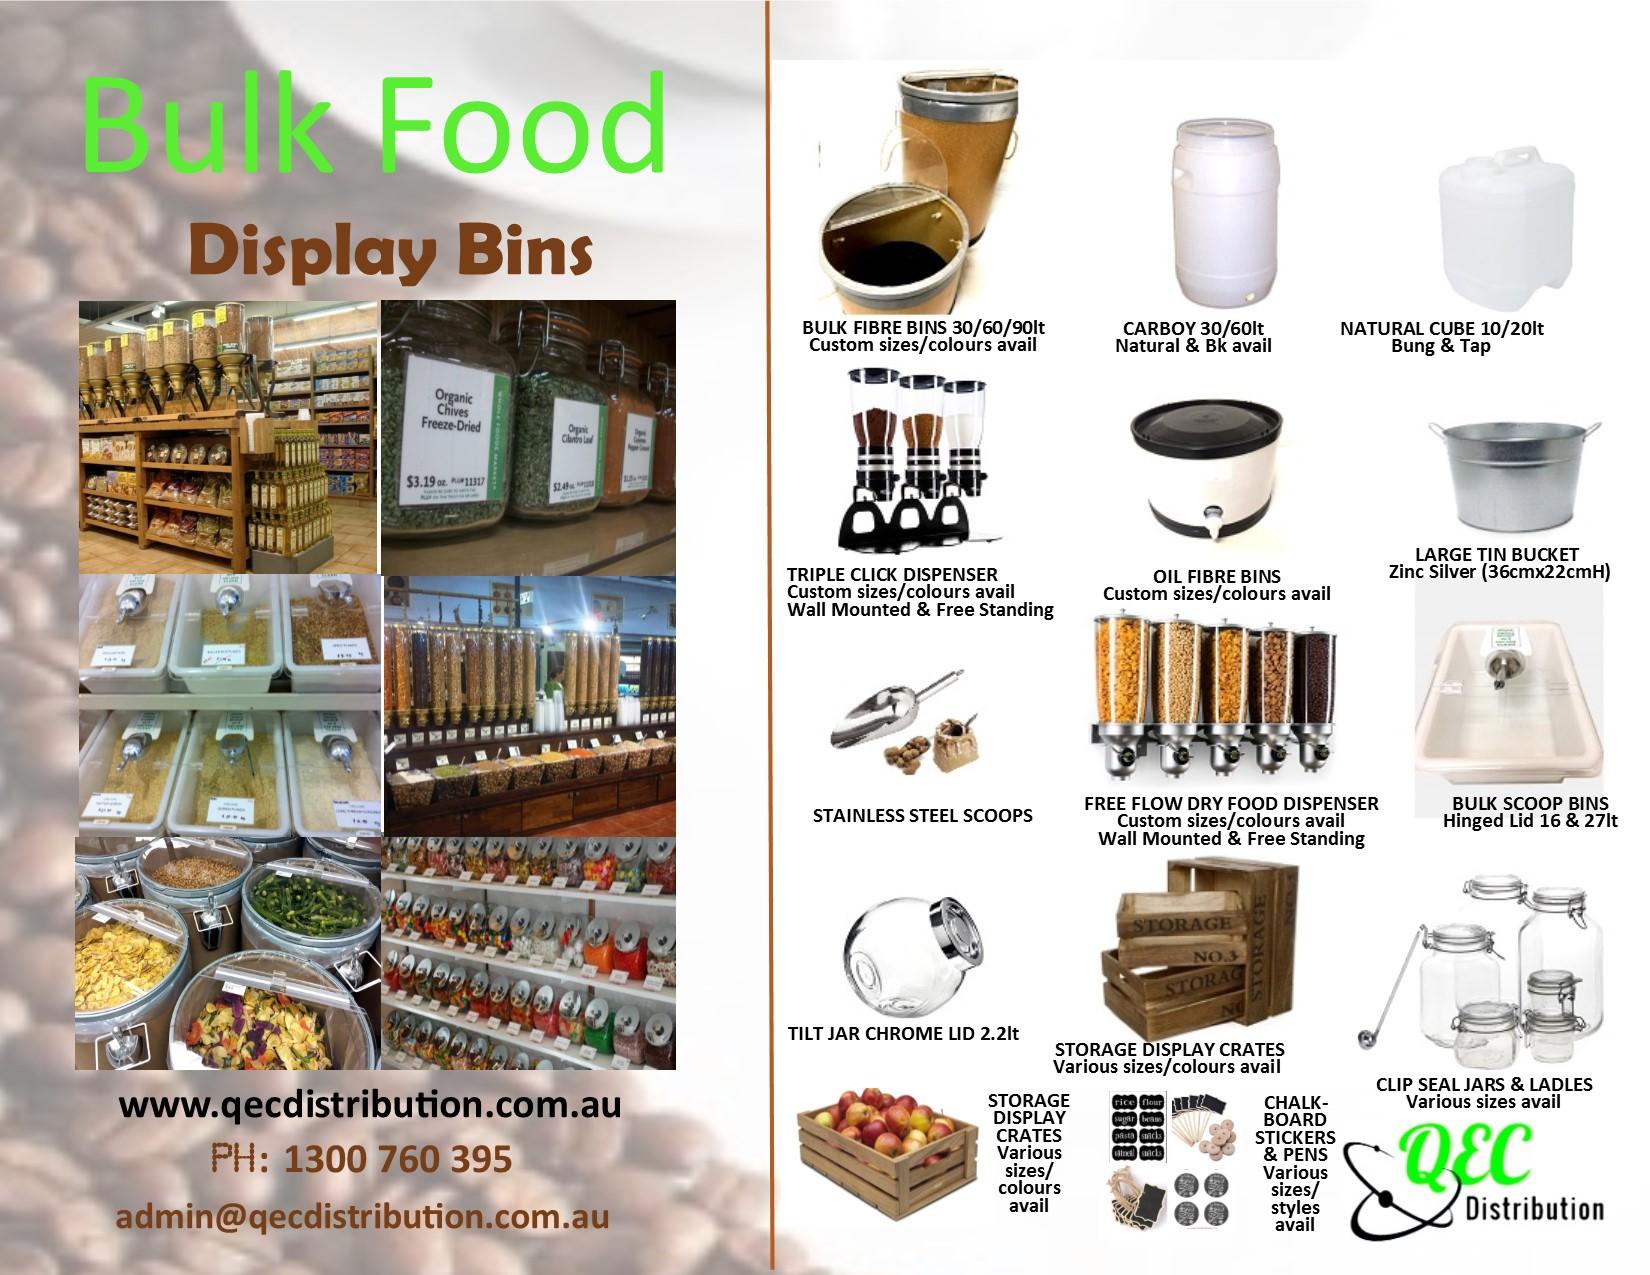 Bulk Dry Food Bins | Promotions | Crates | fibre Bins | Dispenser | Display Bins |